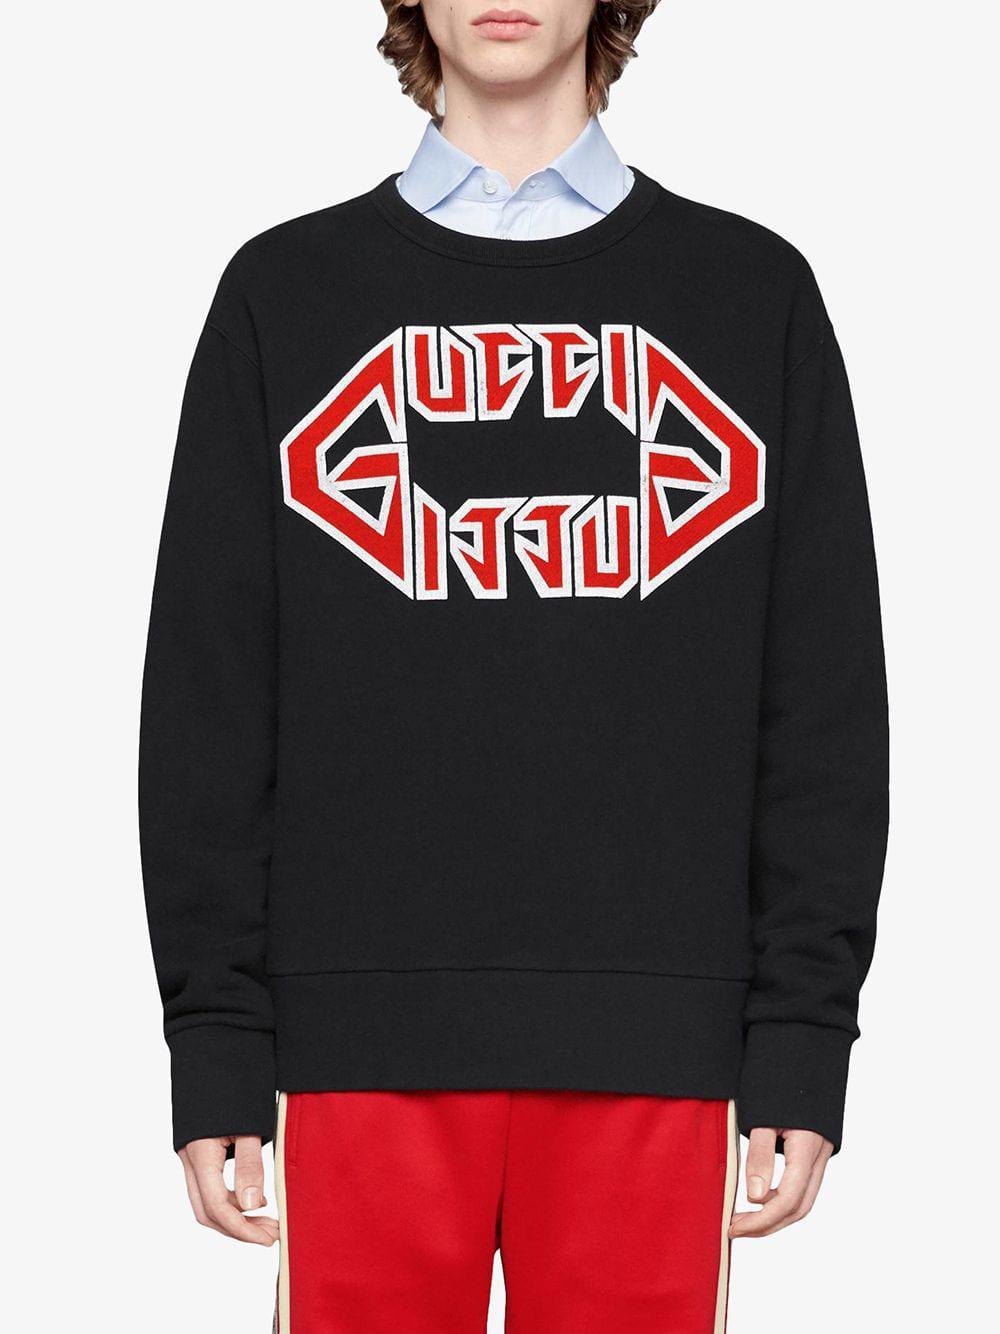 ba142515f3 Men's Black Cotton Sweatshirt With Metal Print